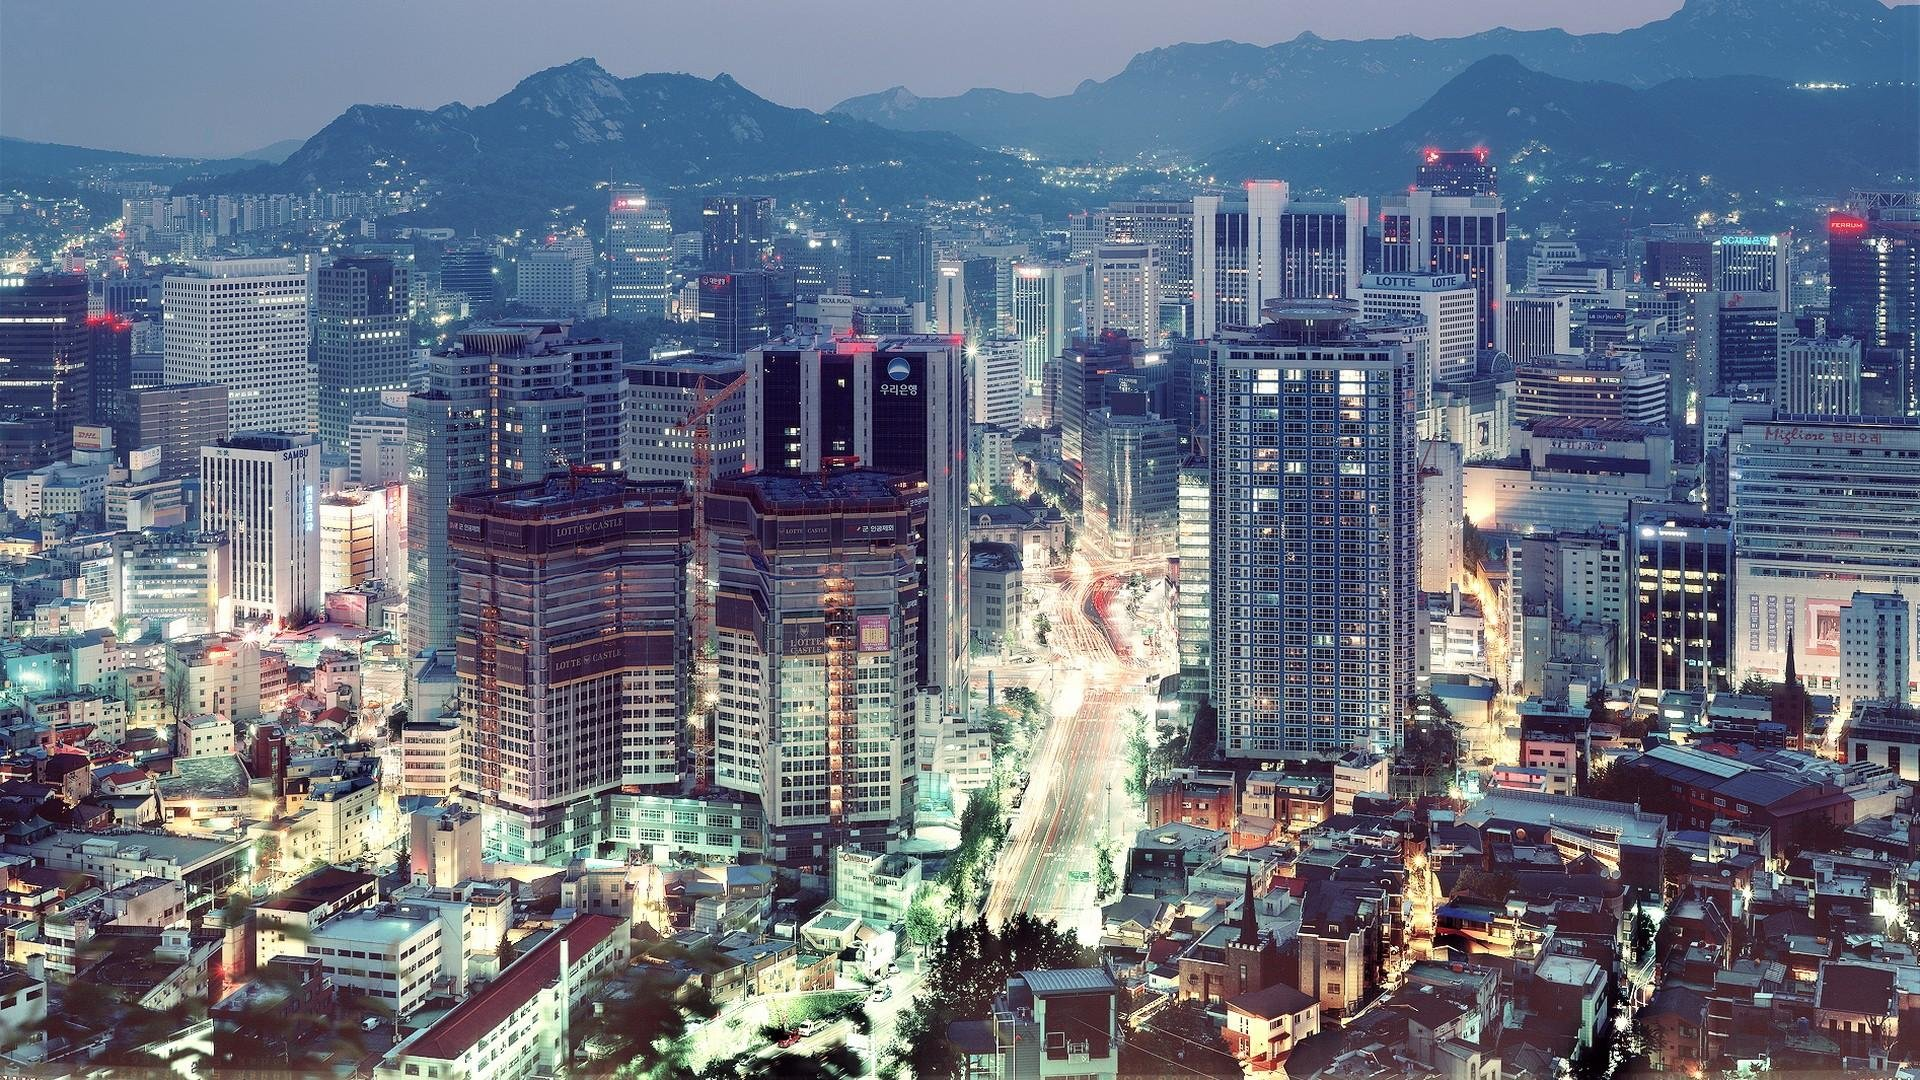 South Korea Wallpapers Hd For Desktop Backgrounds